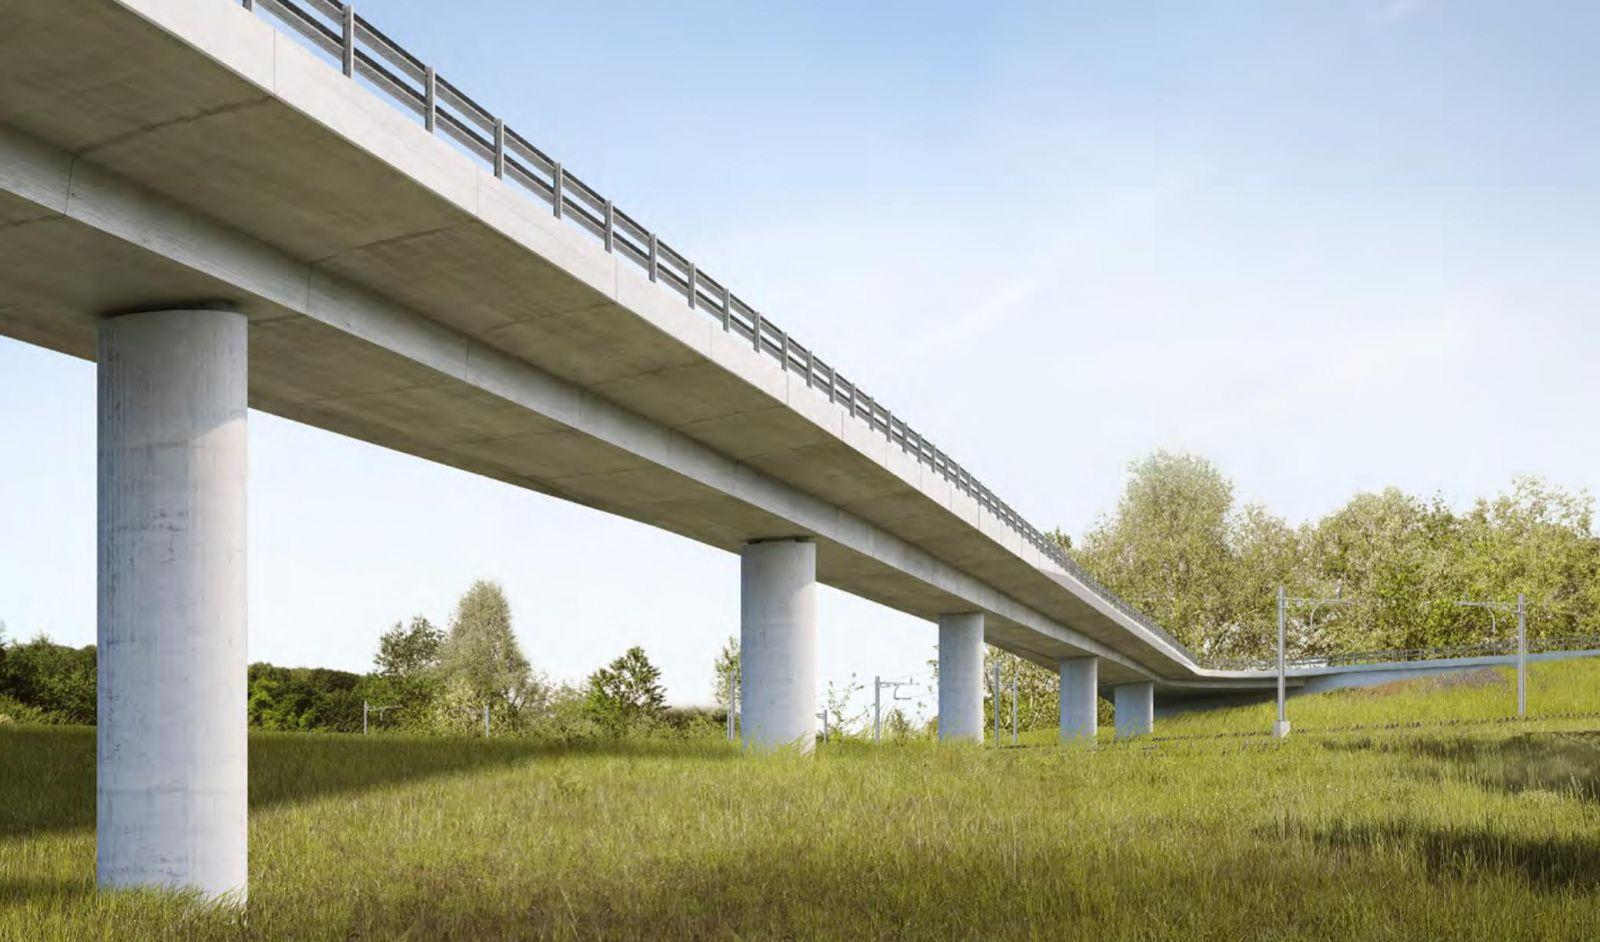 Construction du pont du Tiguelet (RC Axe 2200 Givisiez–Grolley–Payerne, suppression du PN de Givisiez), dsp Ingenieure & Planer + Spataro Petoud Partner + Architekt Balz Amrein, «Lotus»